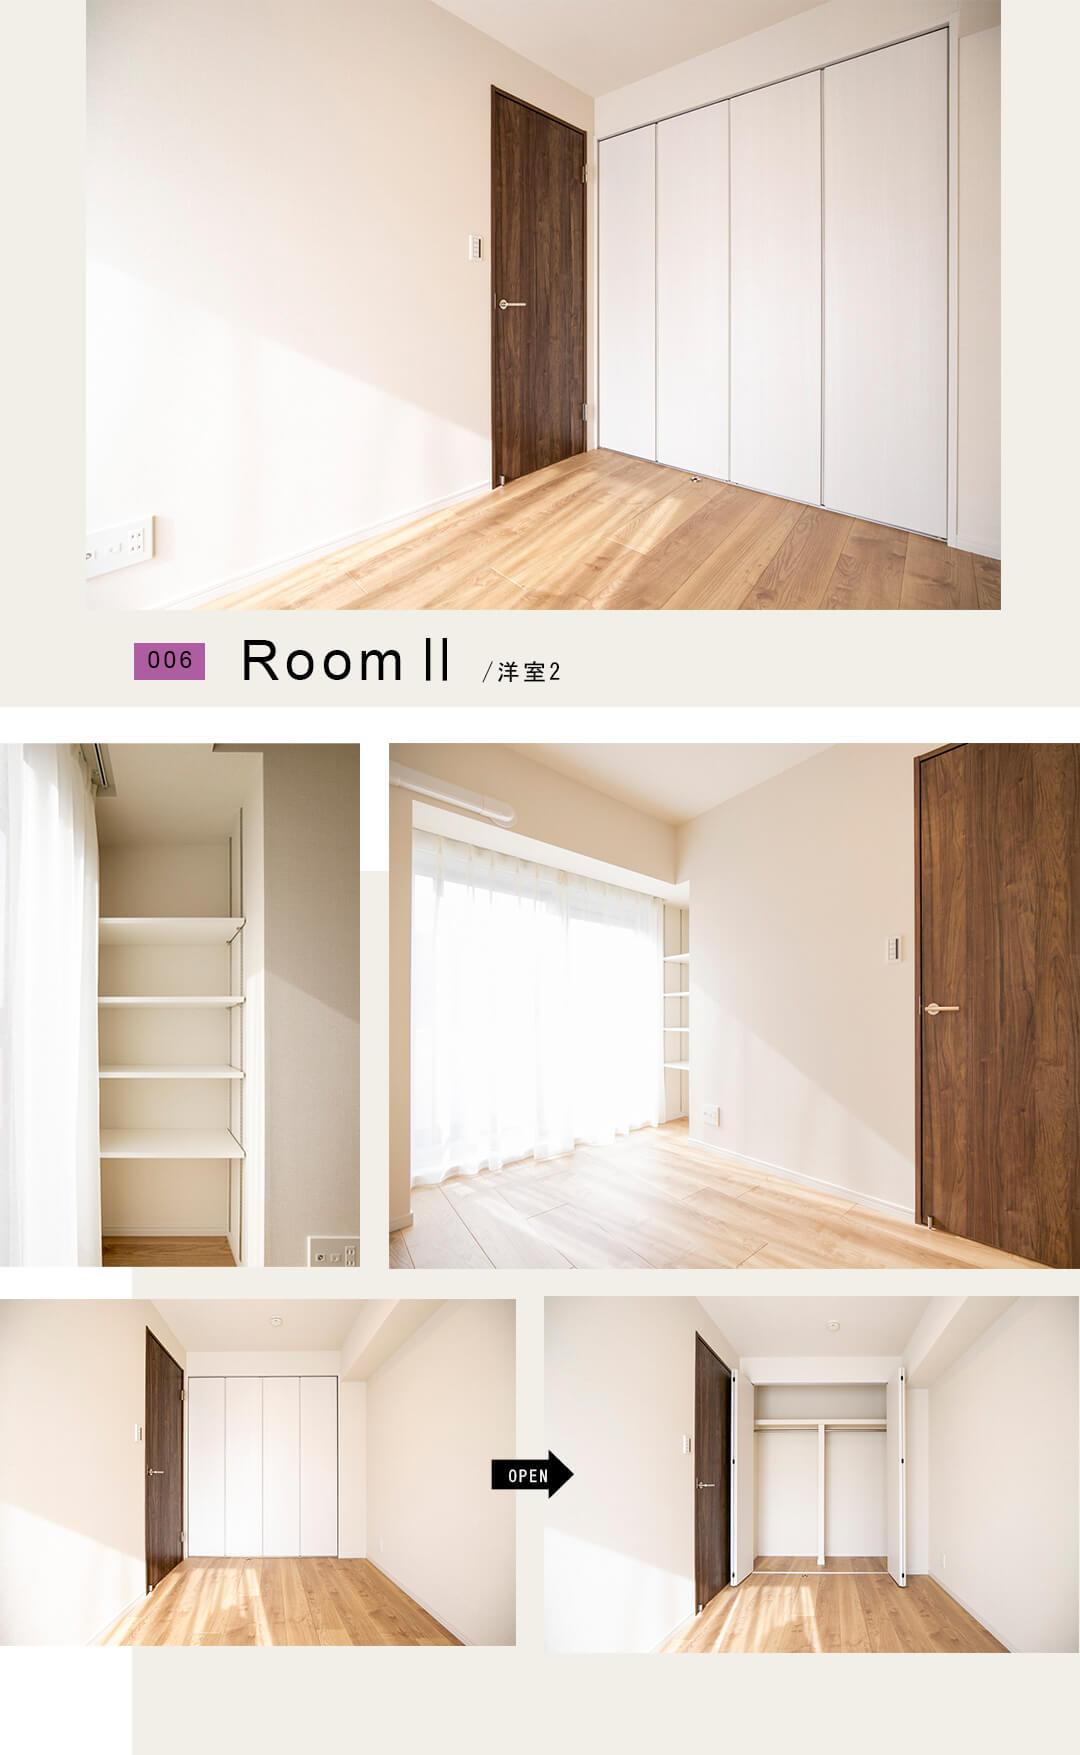 006,RoomⅡ,洋室2